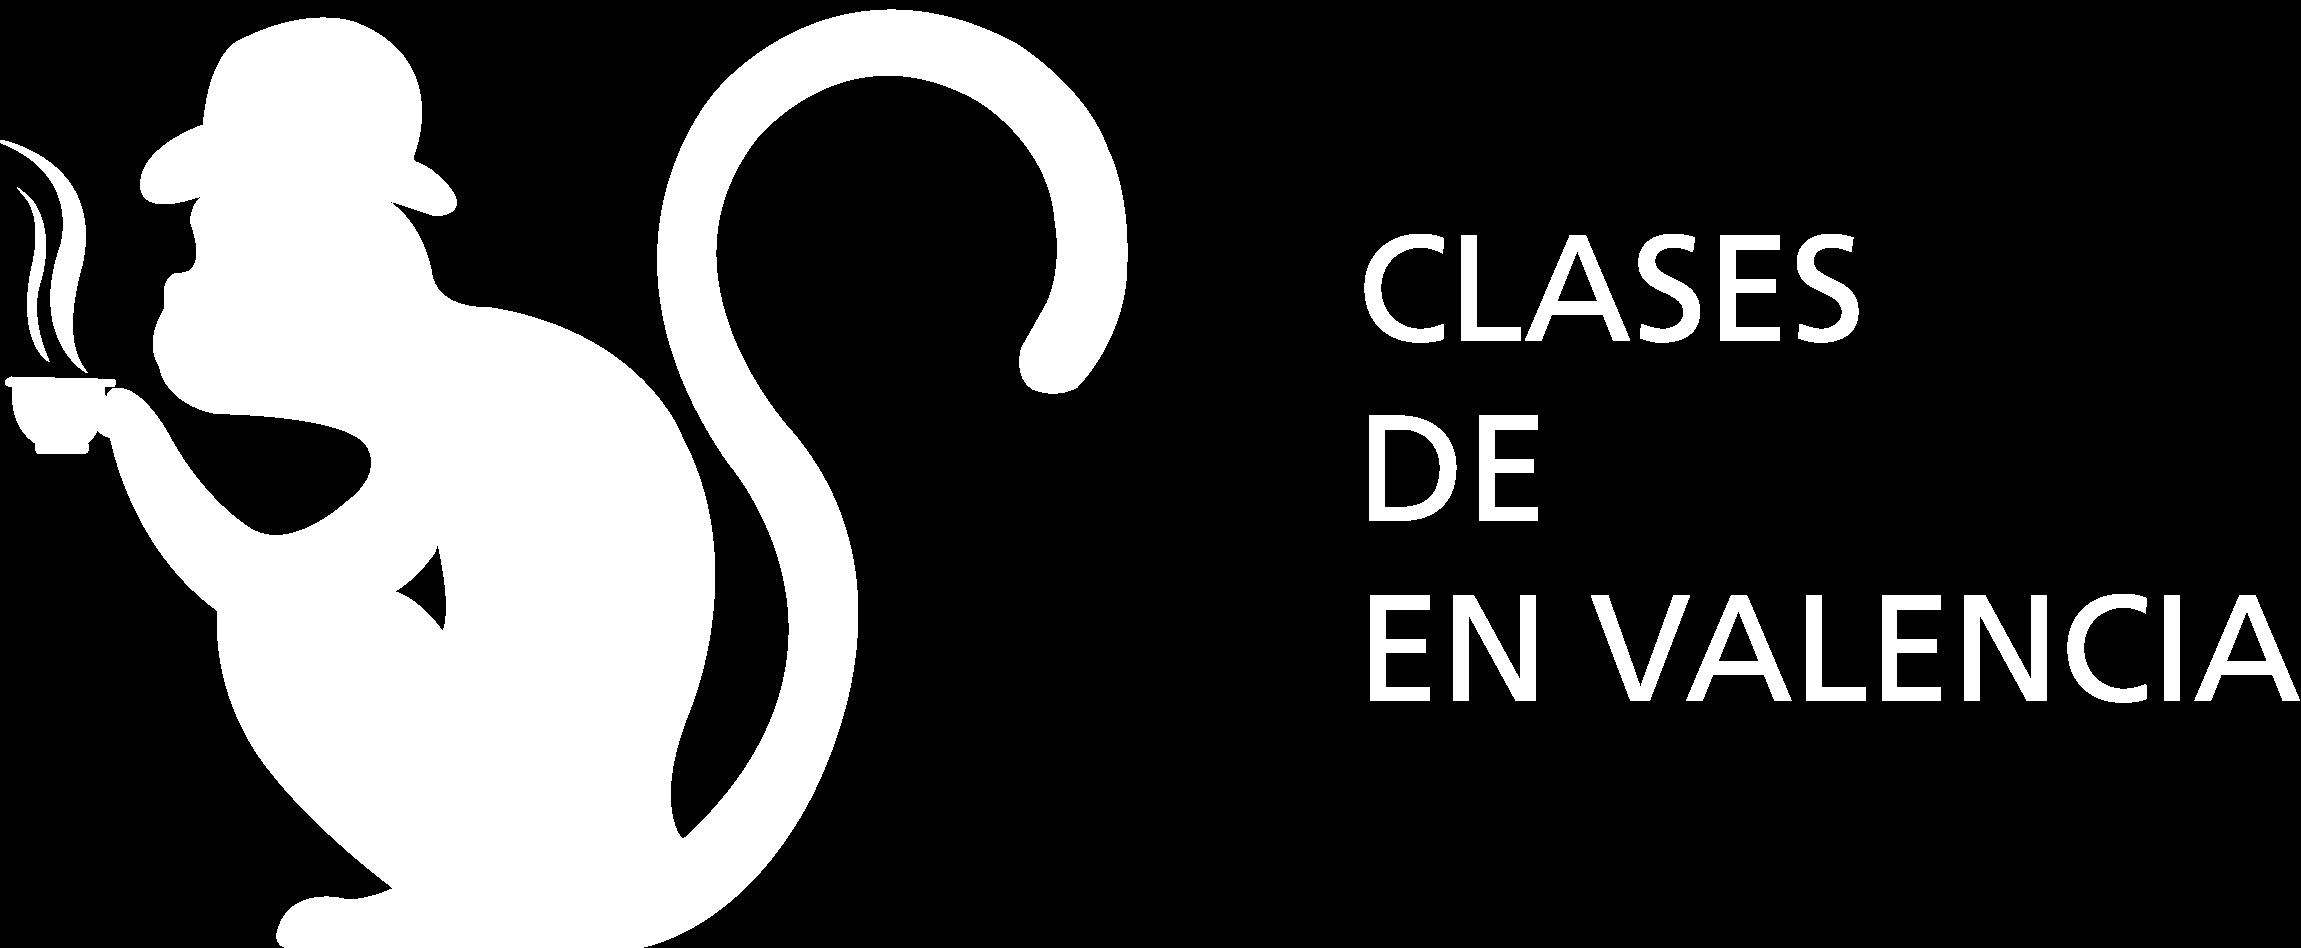 Clases de Inglés en valencia